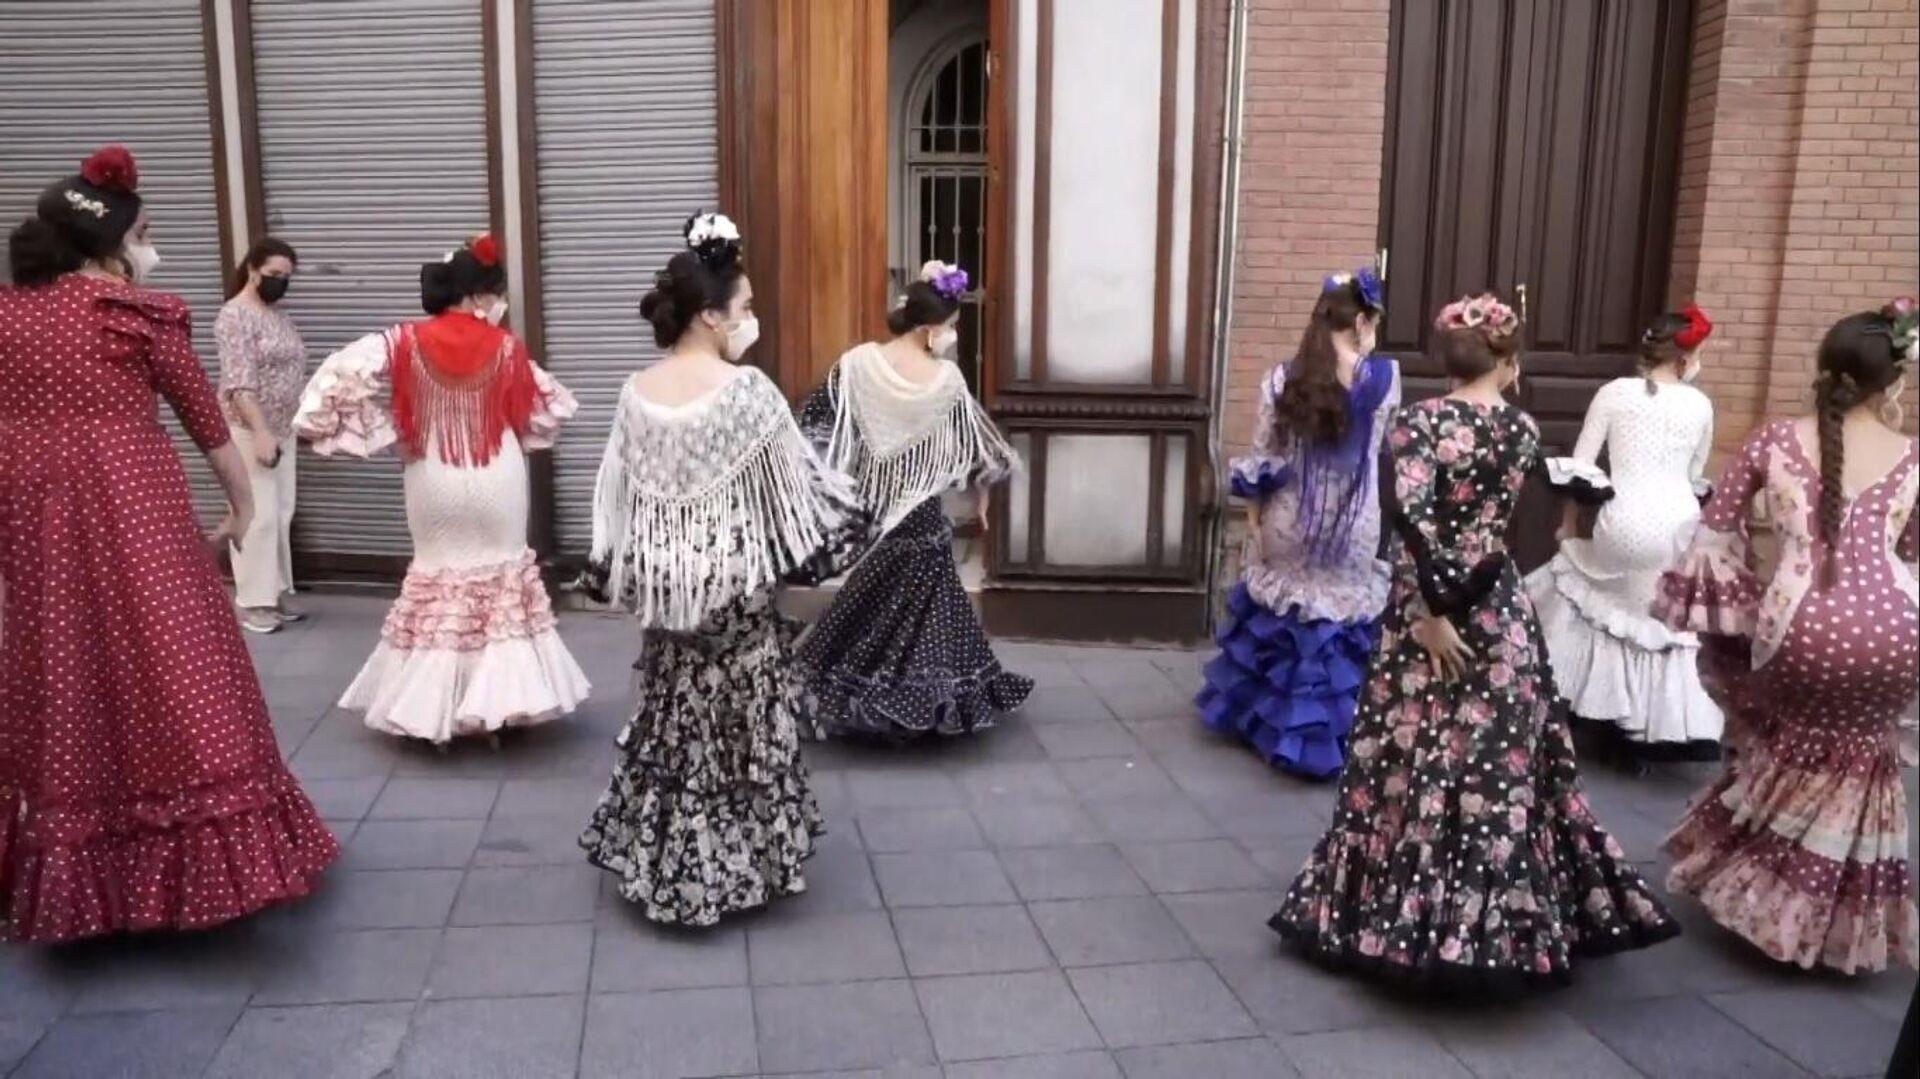 Flamenco en las calles de Sevilla para recrear la Feria - Sputnik Mundo, 1920, 19.04.2021